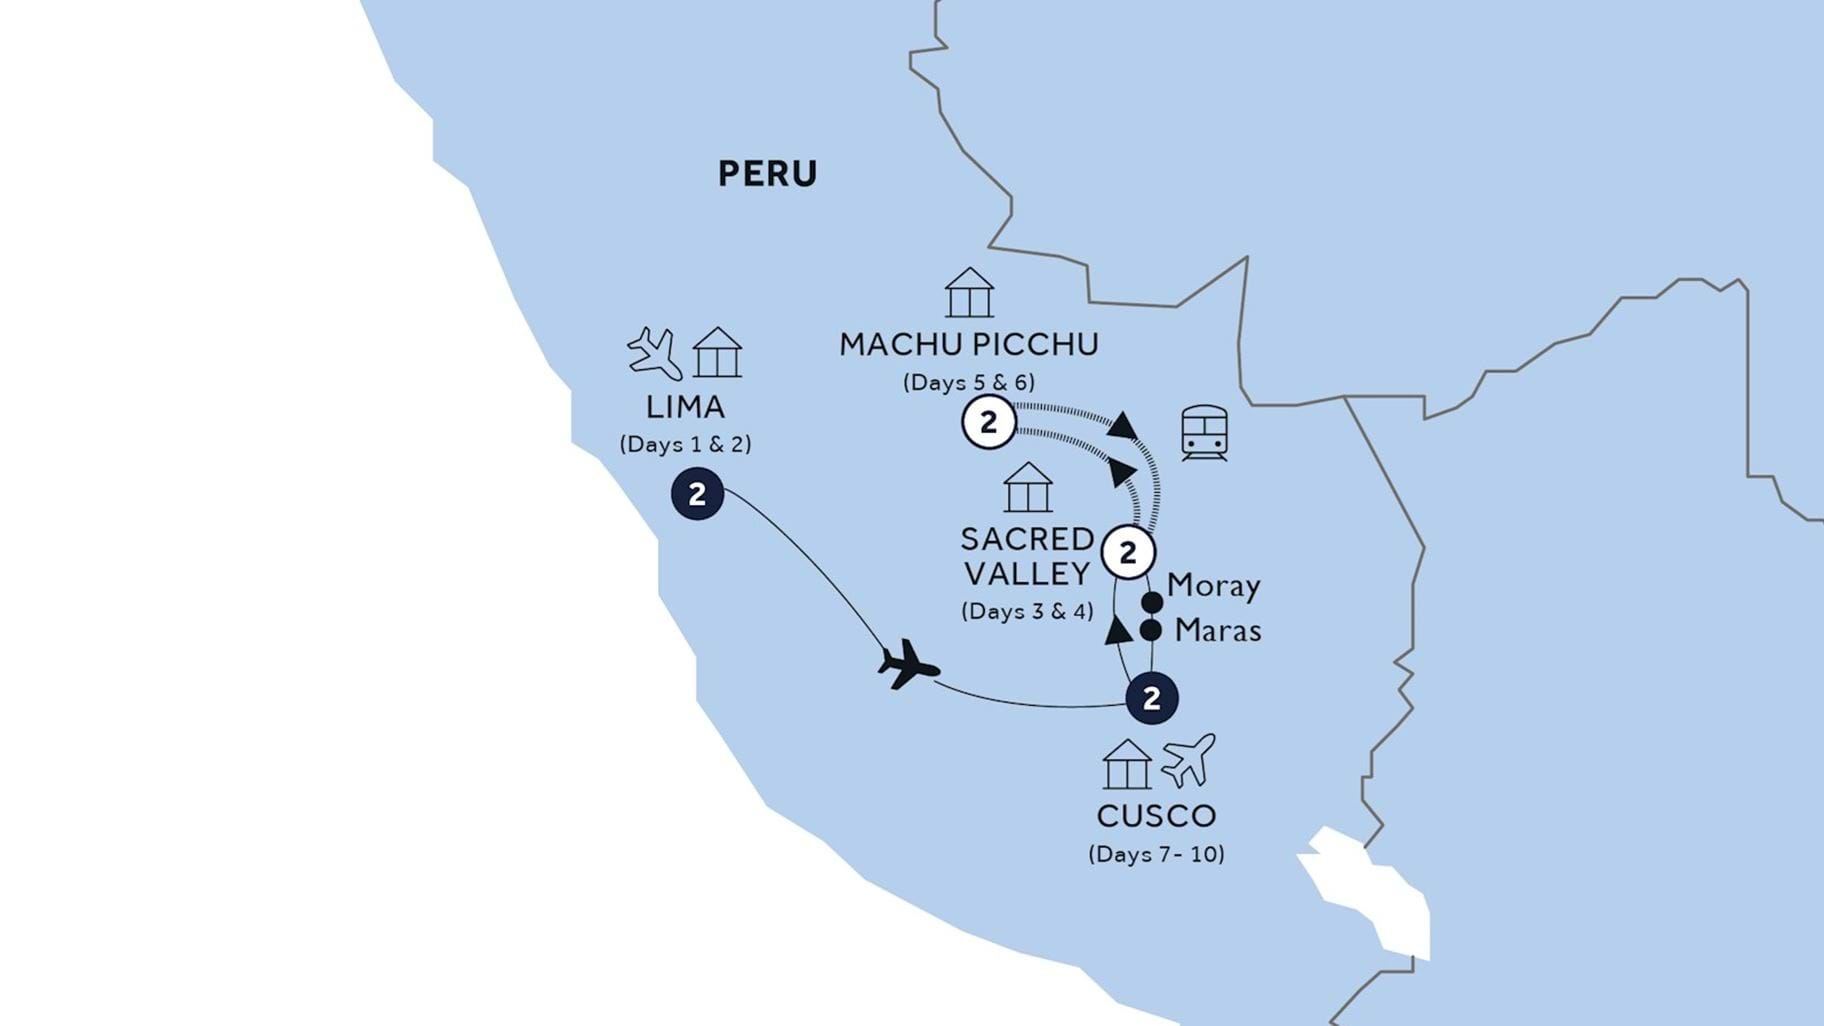 map-peru-machu-picchu-no-nazca-lines-guided-tour.jpg